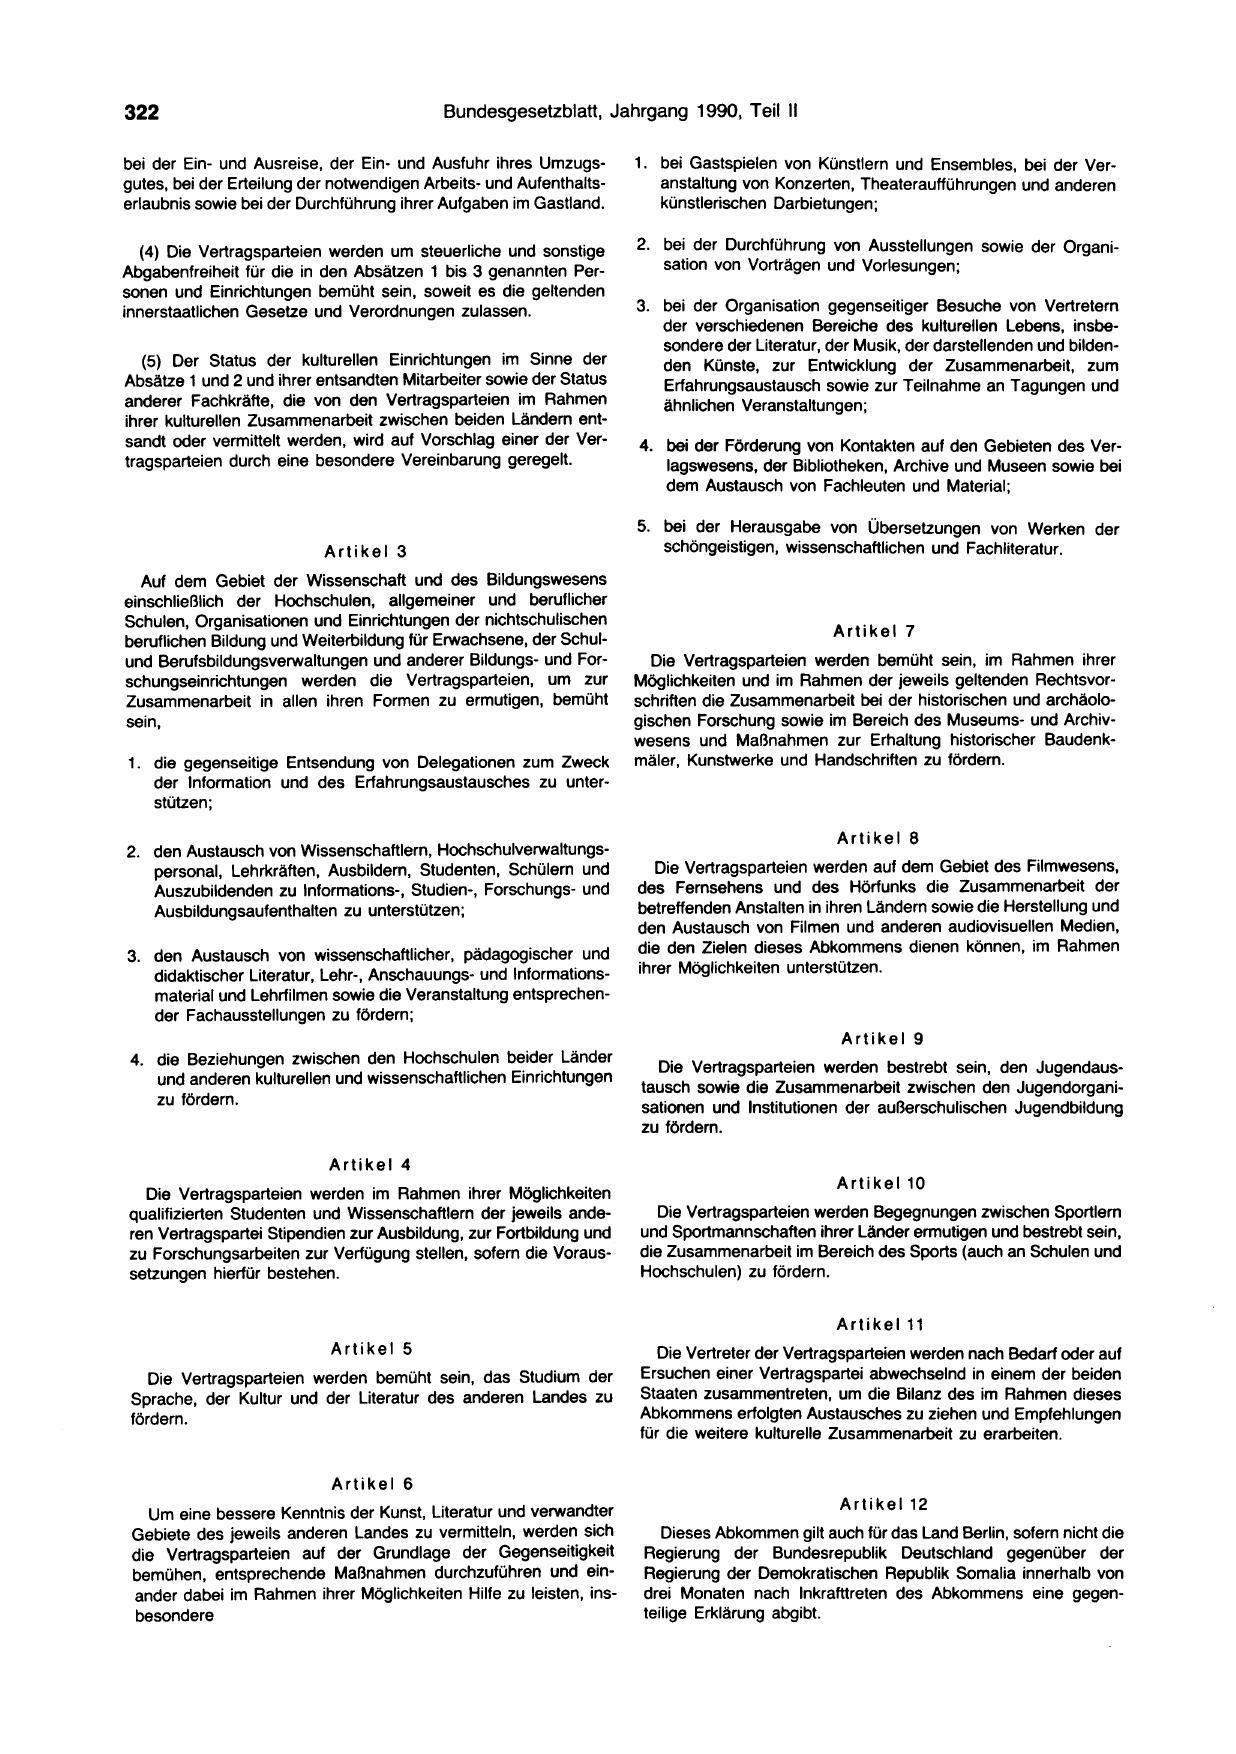 File:Kulturabkommen Somalia 1990 2.jpg - Wikimedia Commons